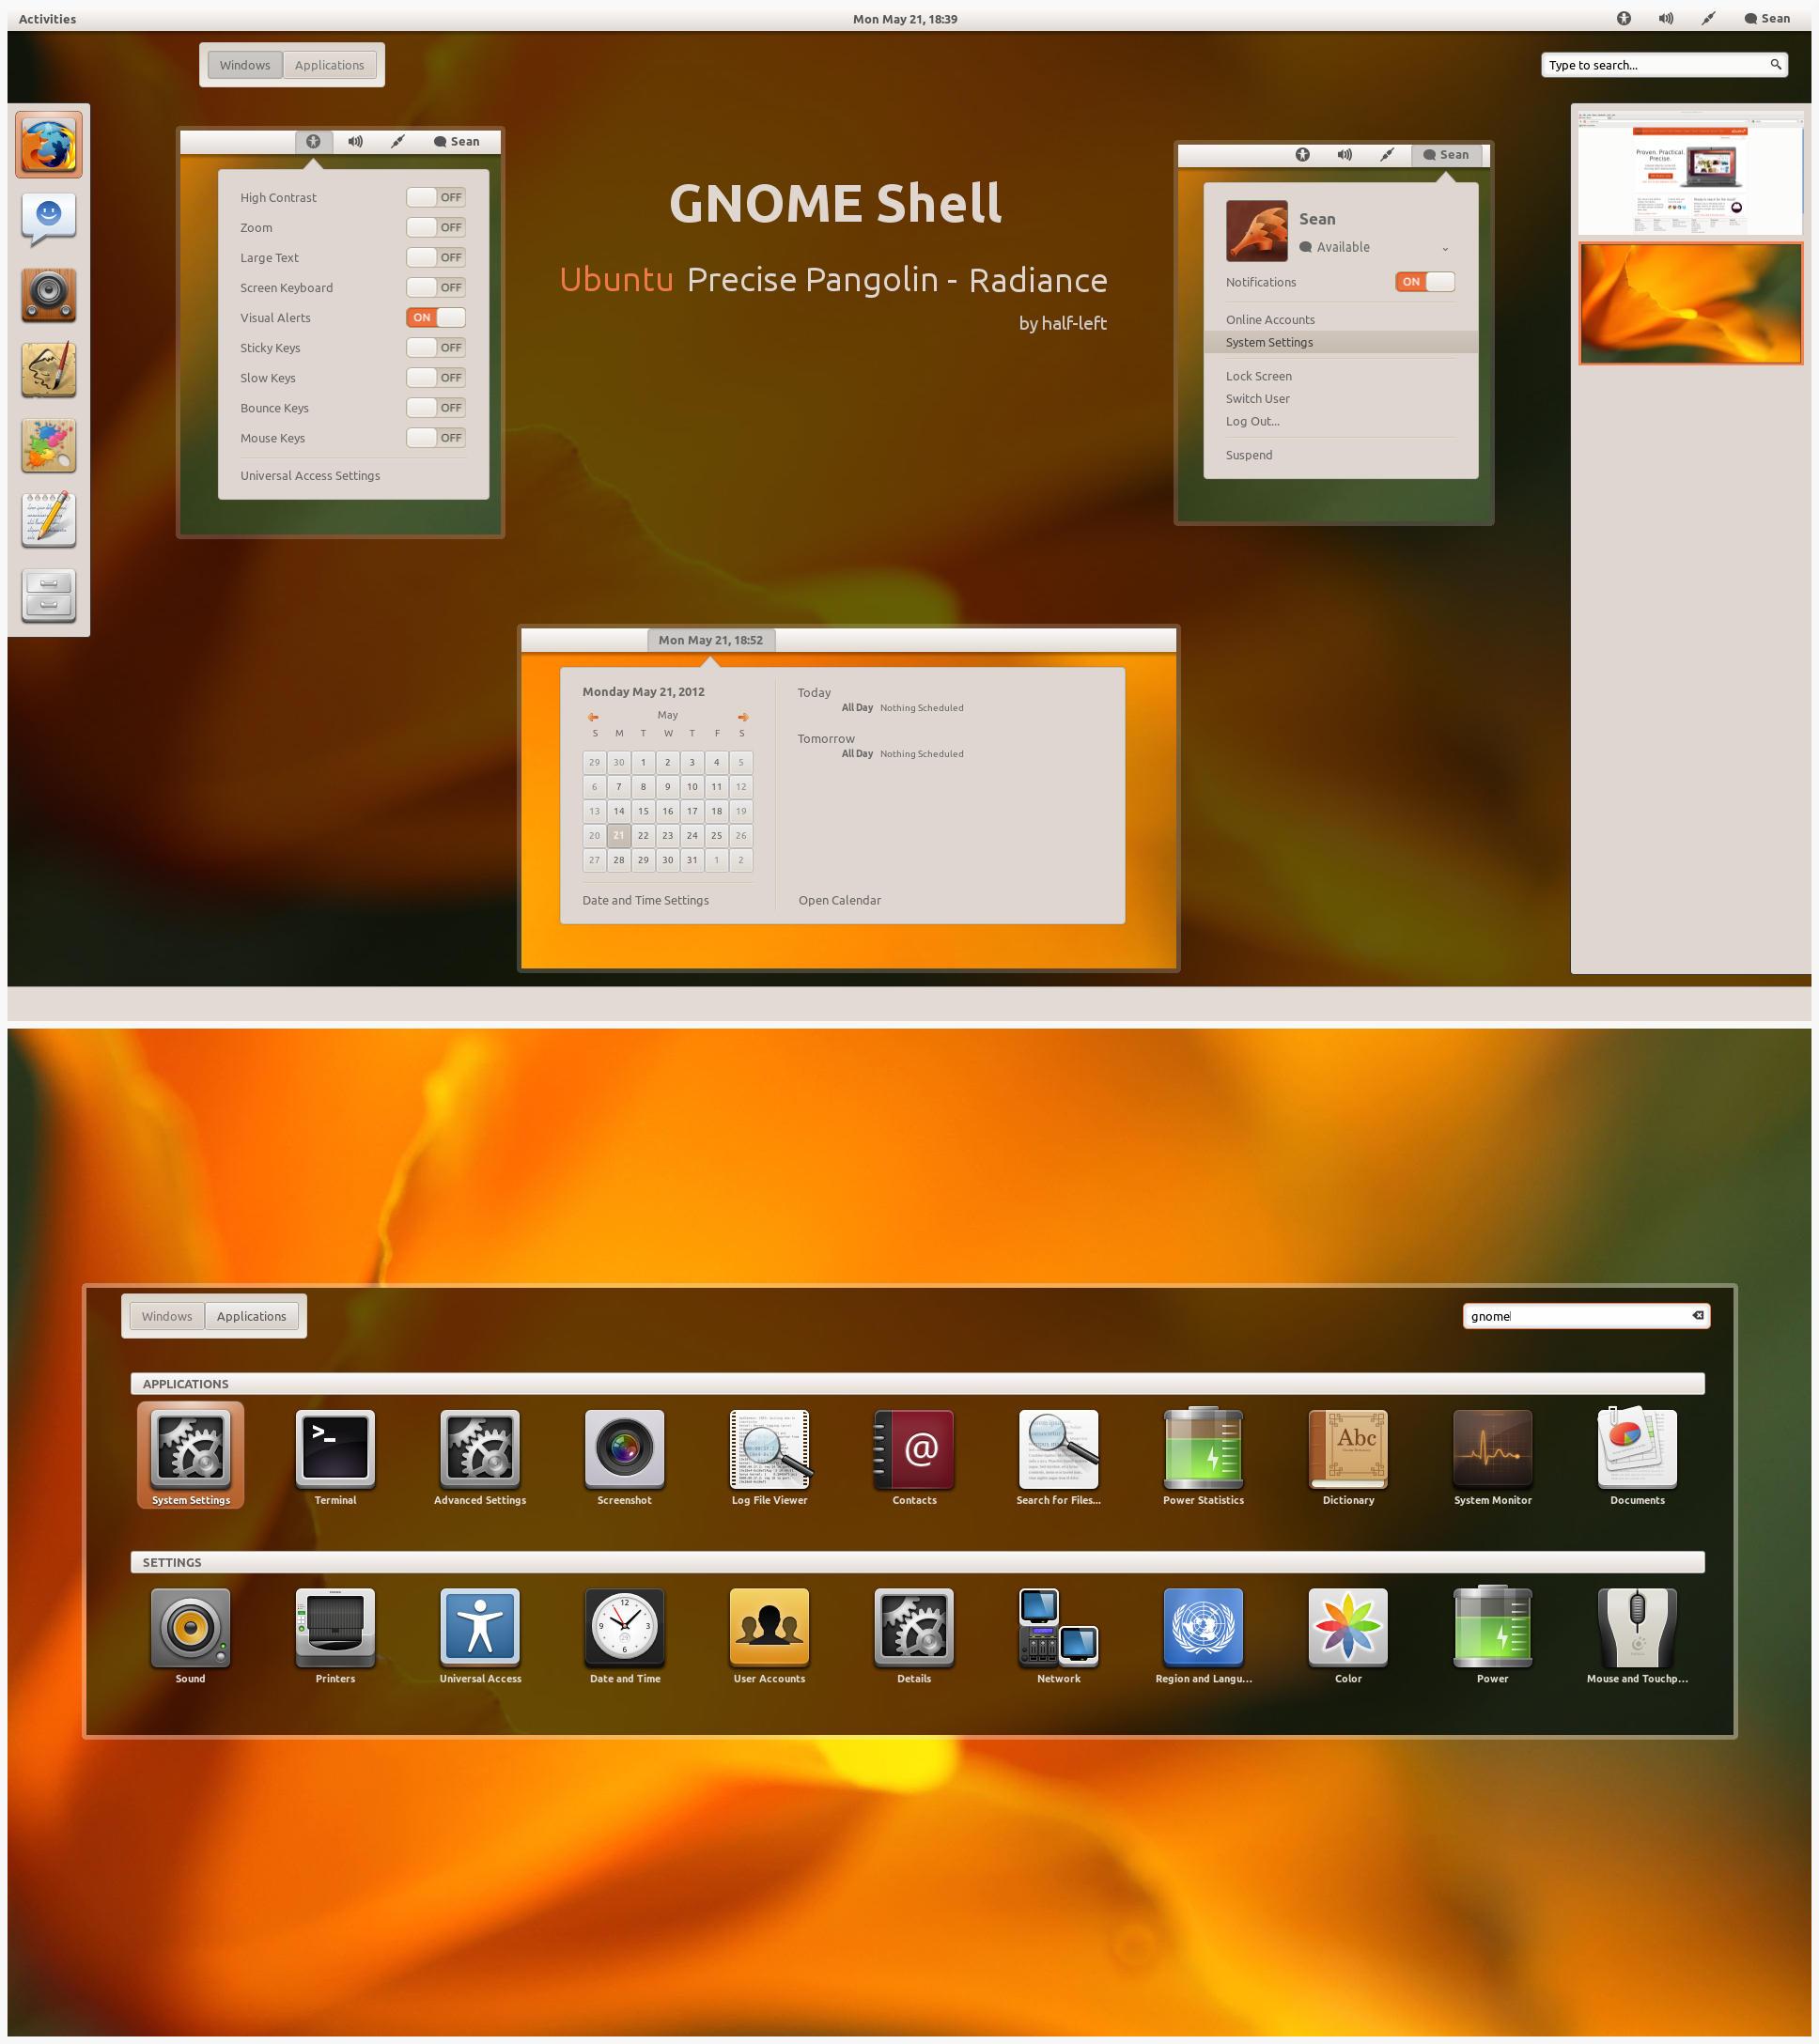 GNOME-Shell - Ubuntu Precise Pangolin - Radiance by half-left